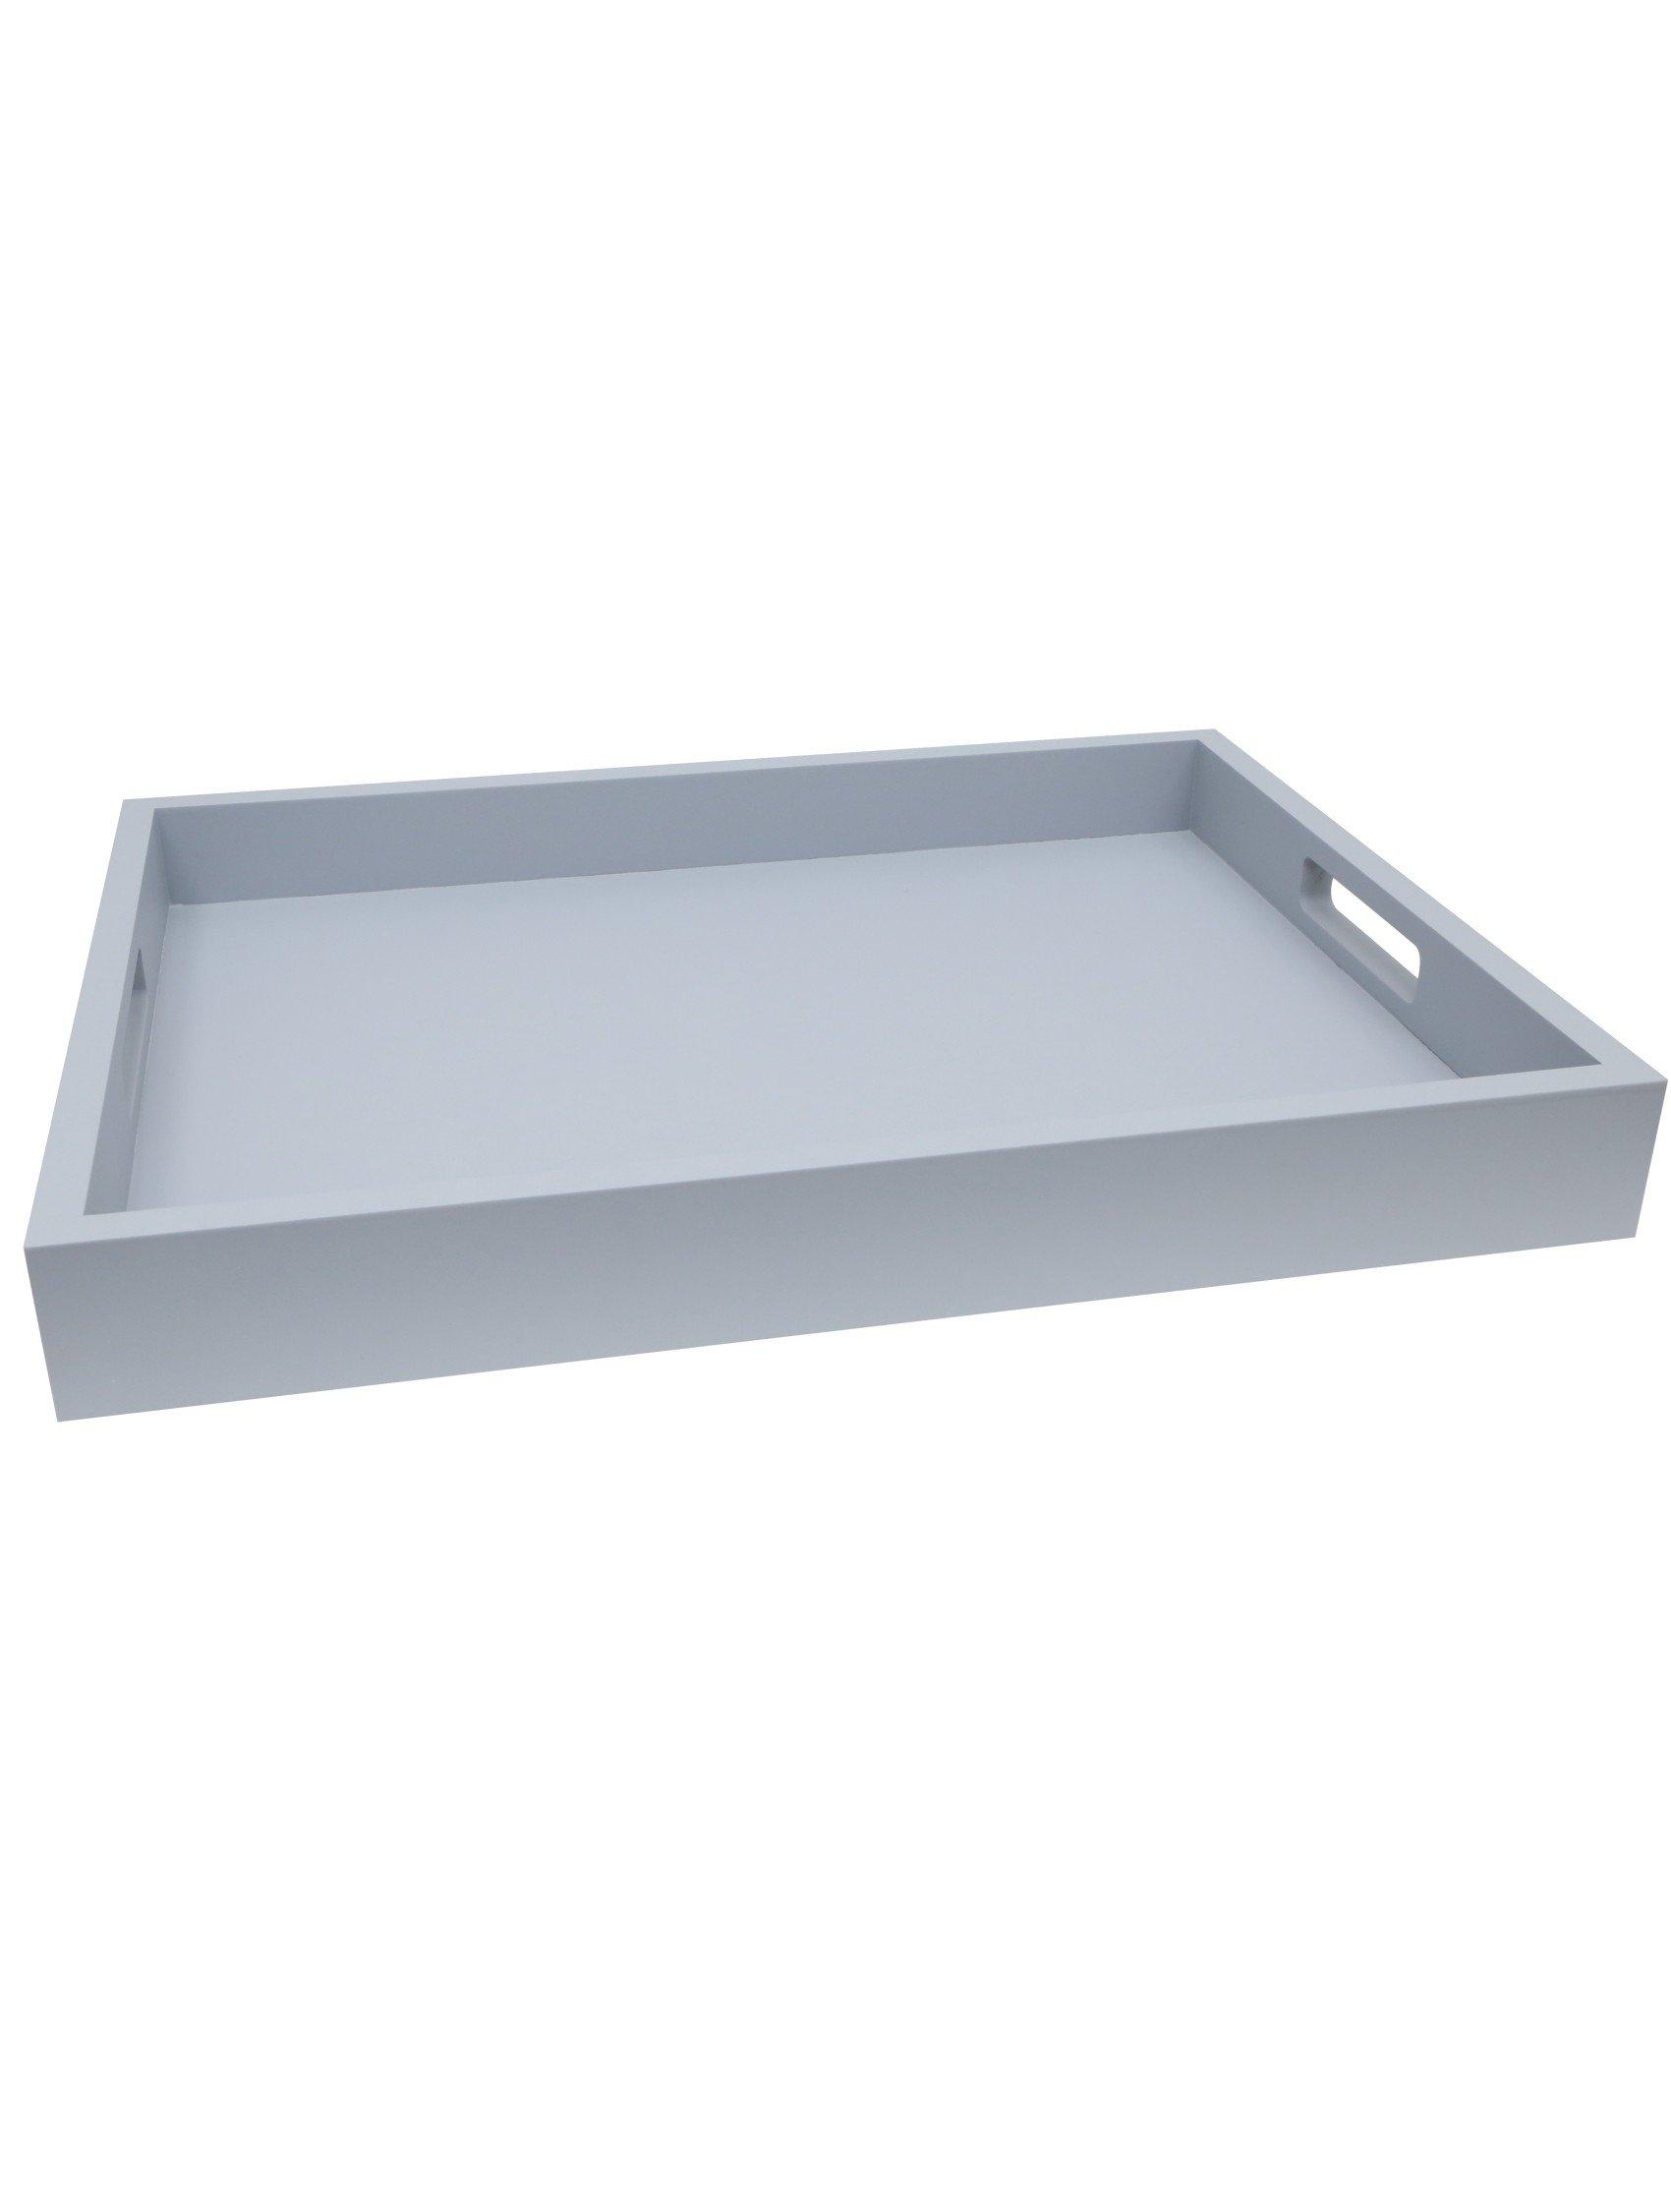 Deknudt, Gifts Gadgets Wood, Grey, 32.5x 43.5x 5cm